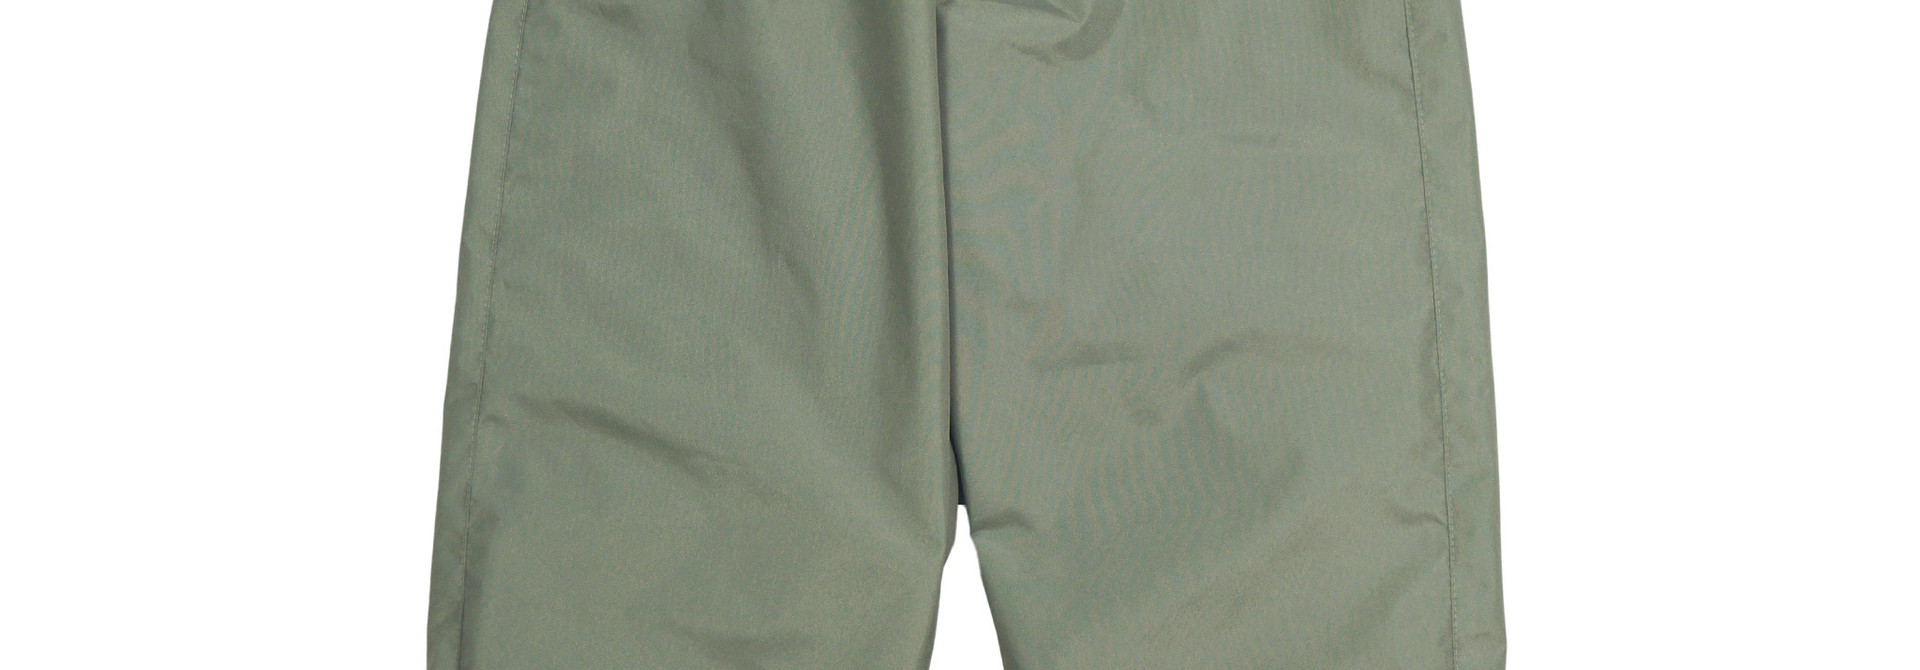 Pantalons mi-saison Taffeta - Kaki